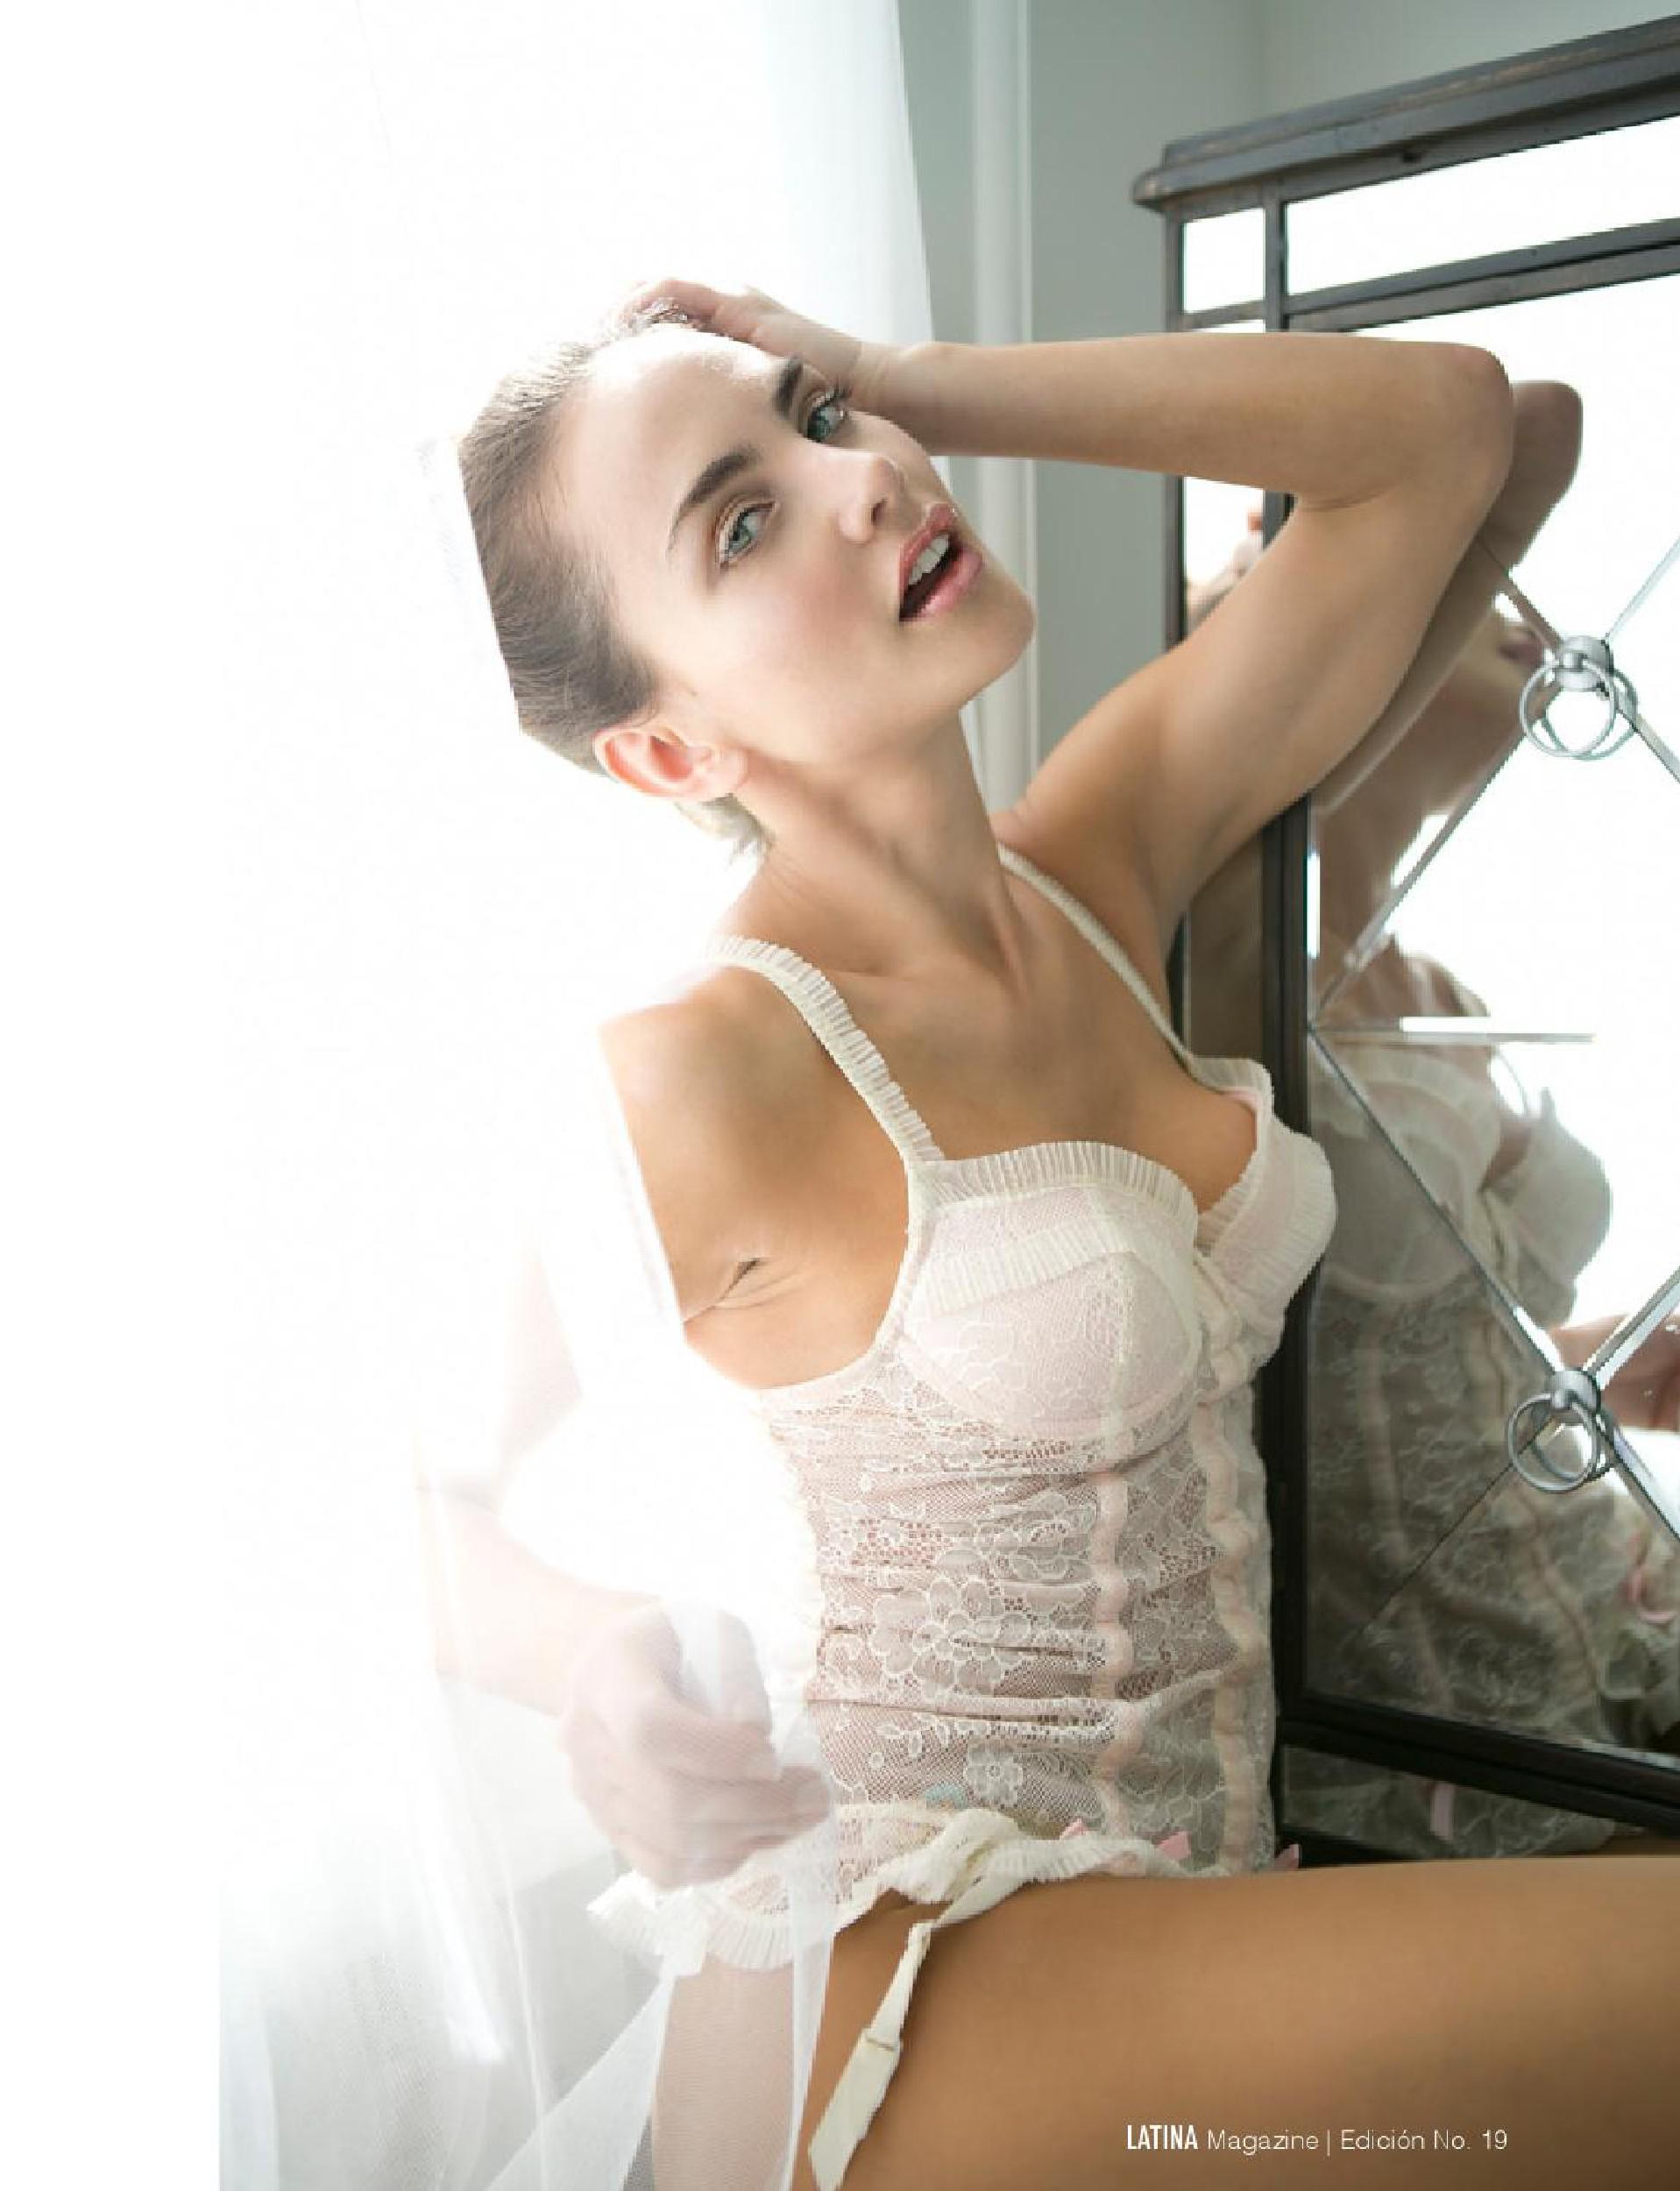 Pussy Ximena Cordoba nude (89 photos), Ass, Sideboobs, Feet, underwear 2019